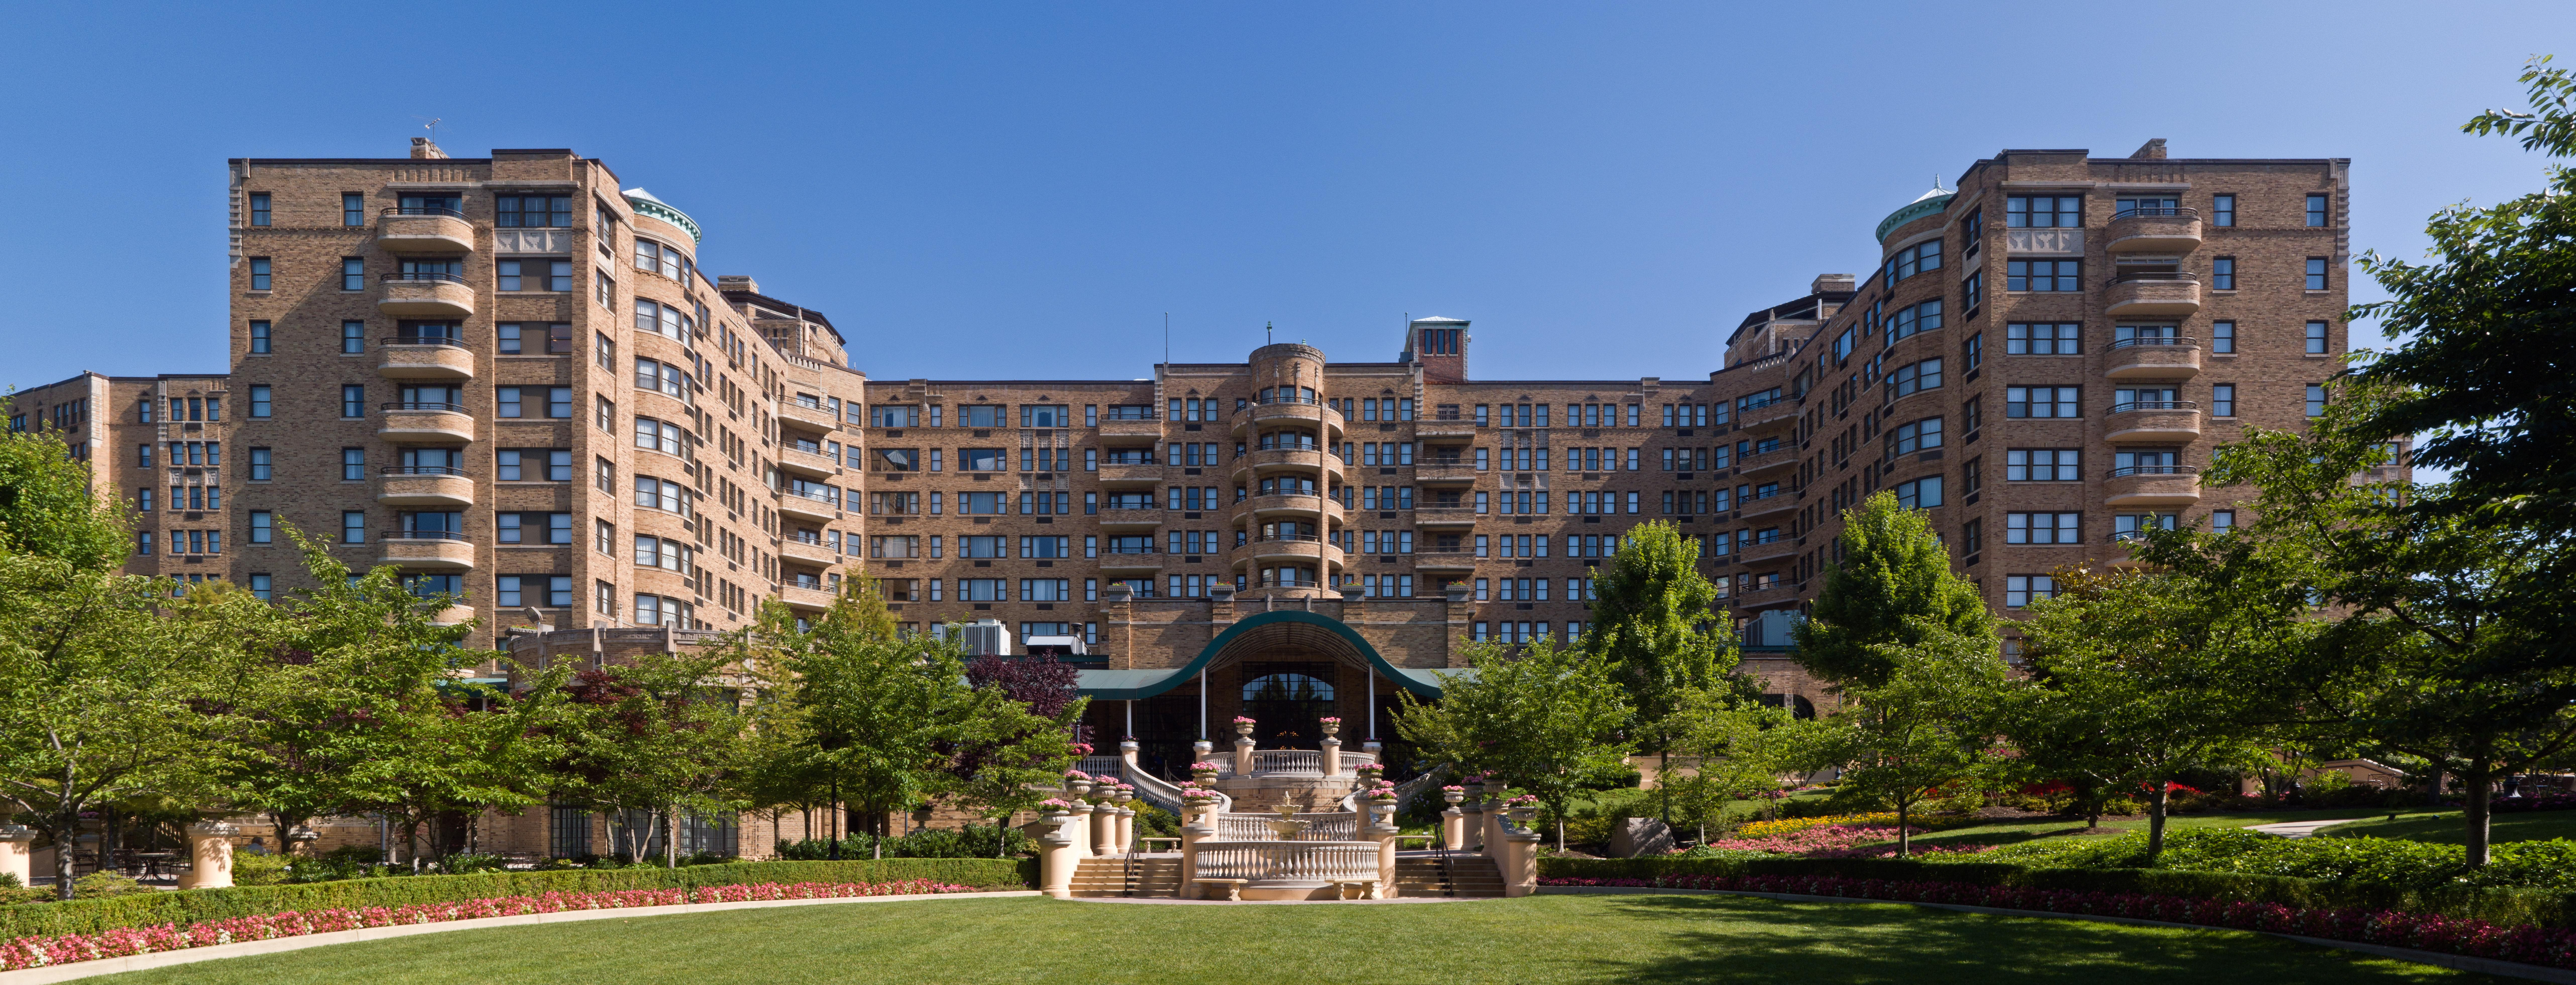 Omni Hotel Nashville Room Ammenaties